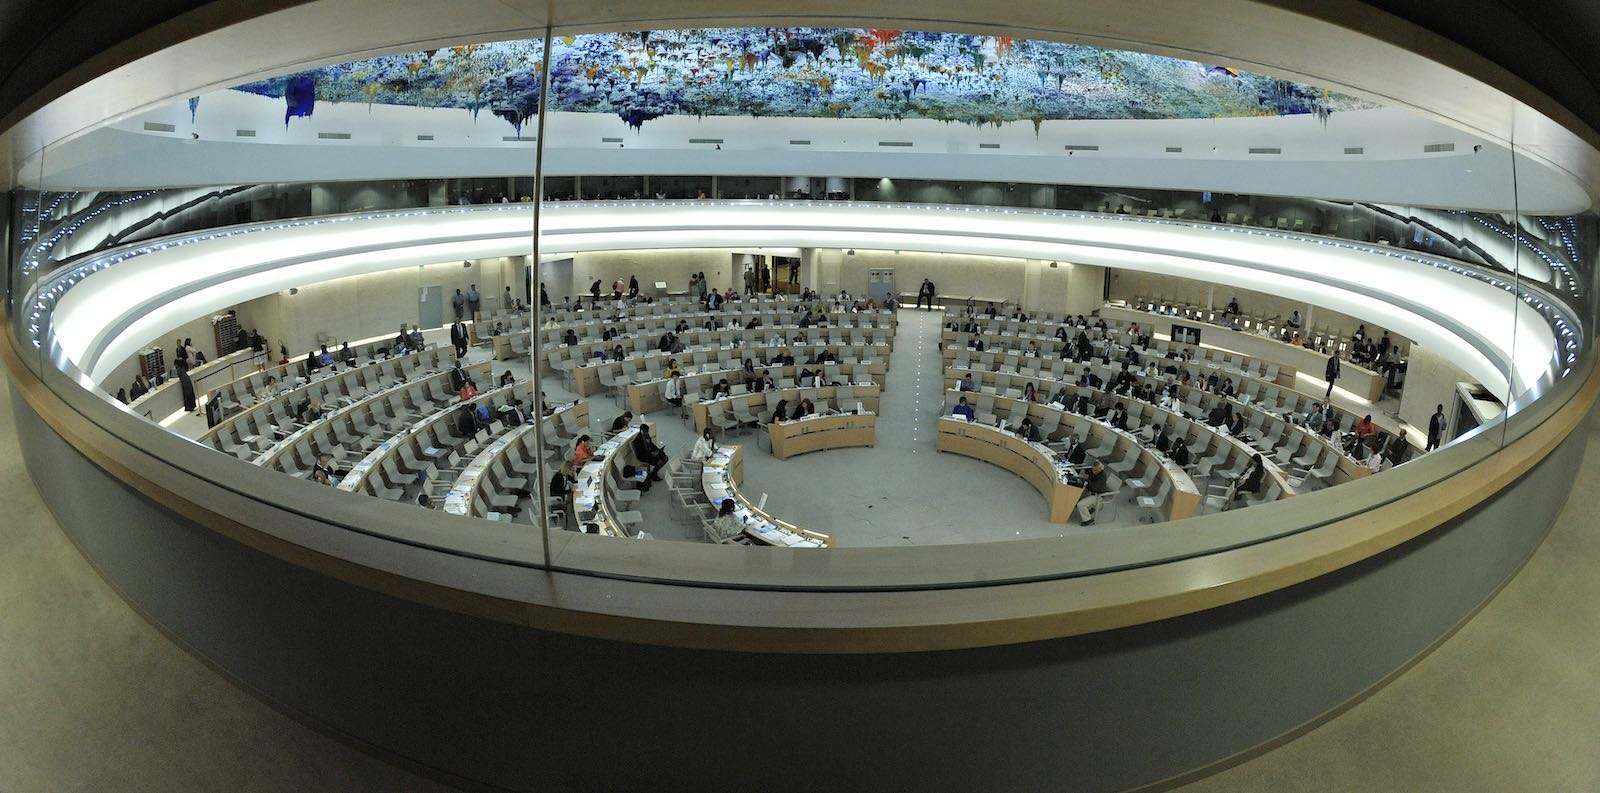 The UN Human Rights Council in Geneva (Photo: UN Photo)